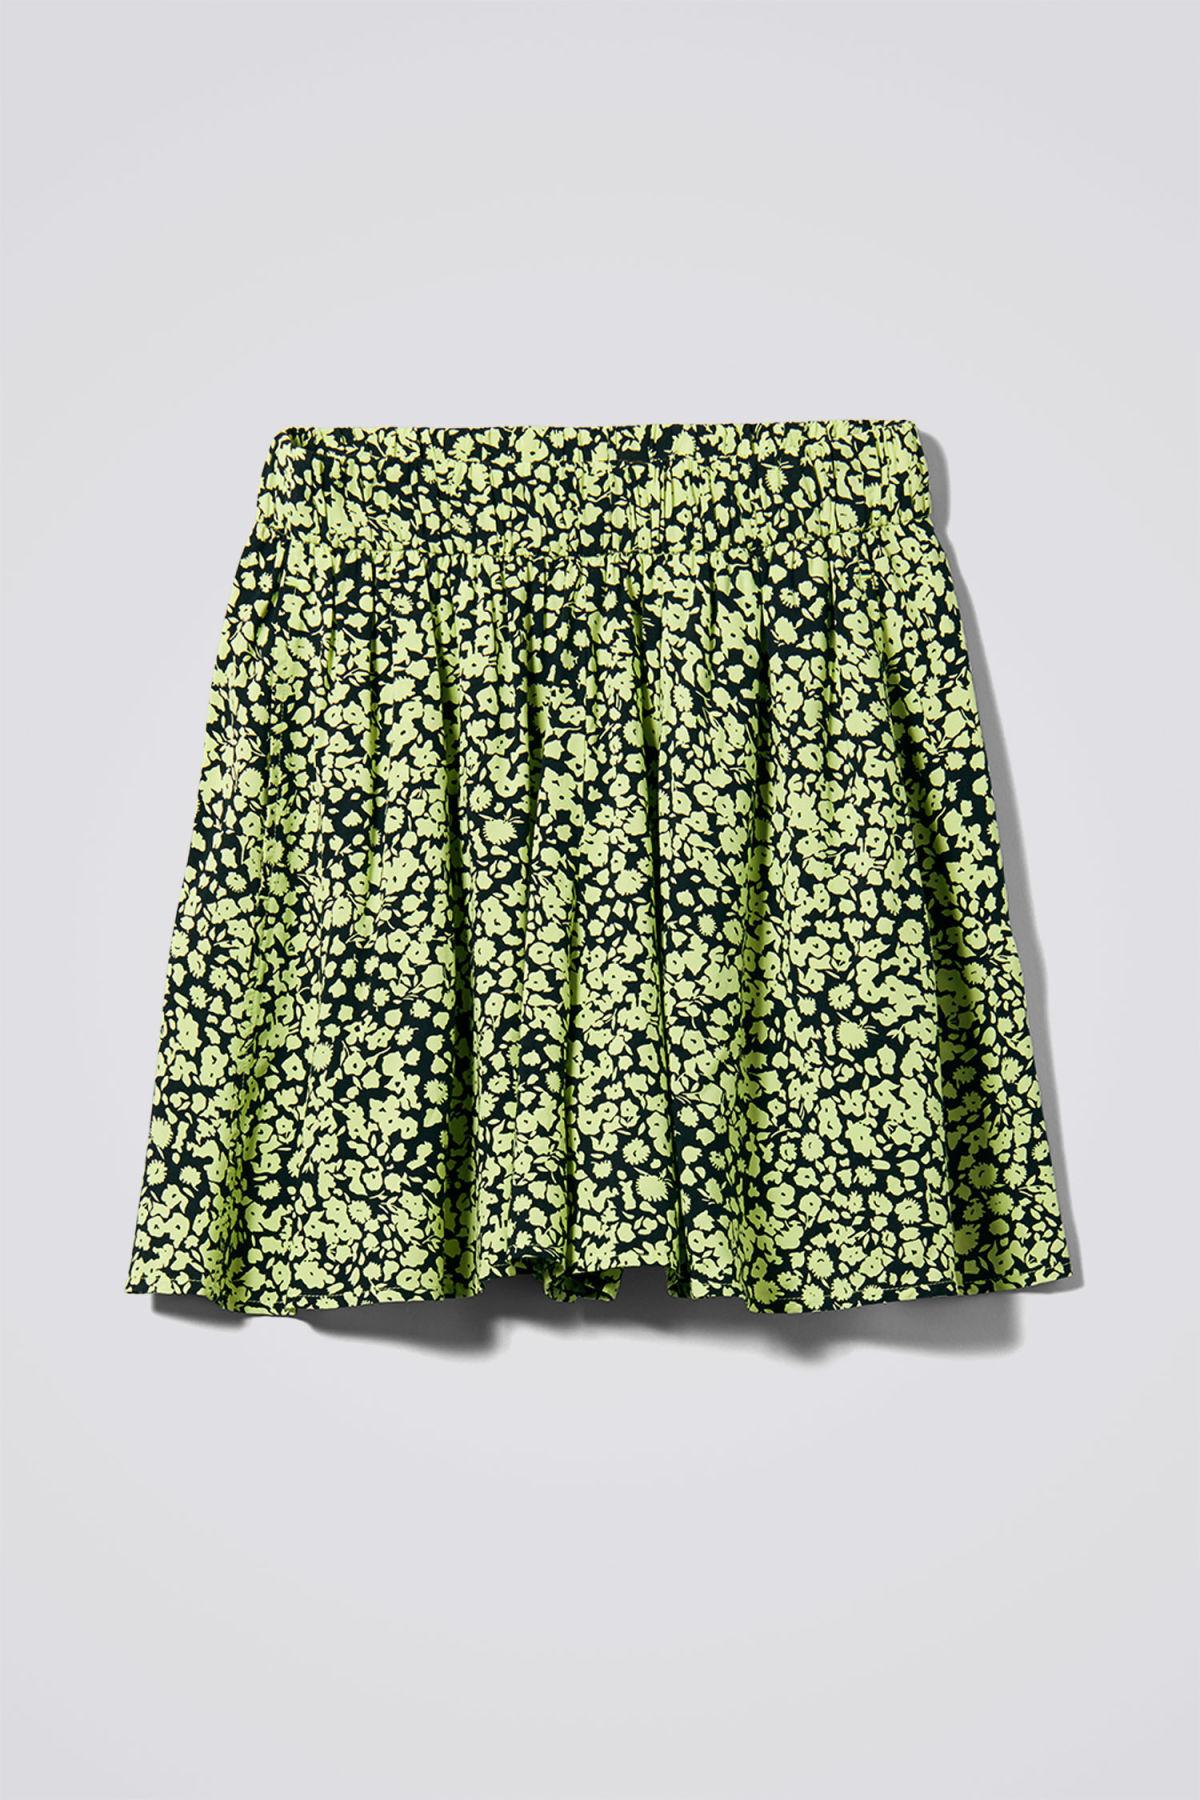 Image of Litz Shorts - Yellow-36